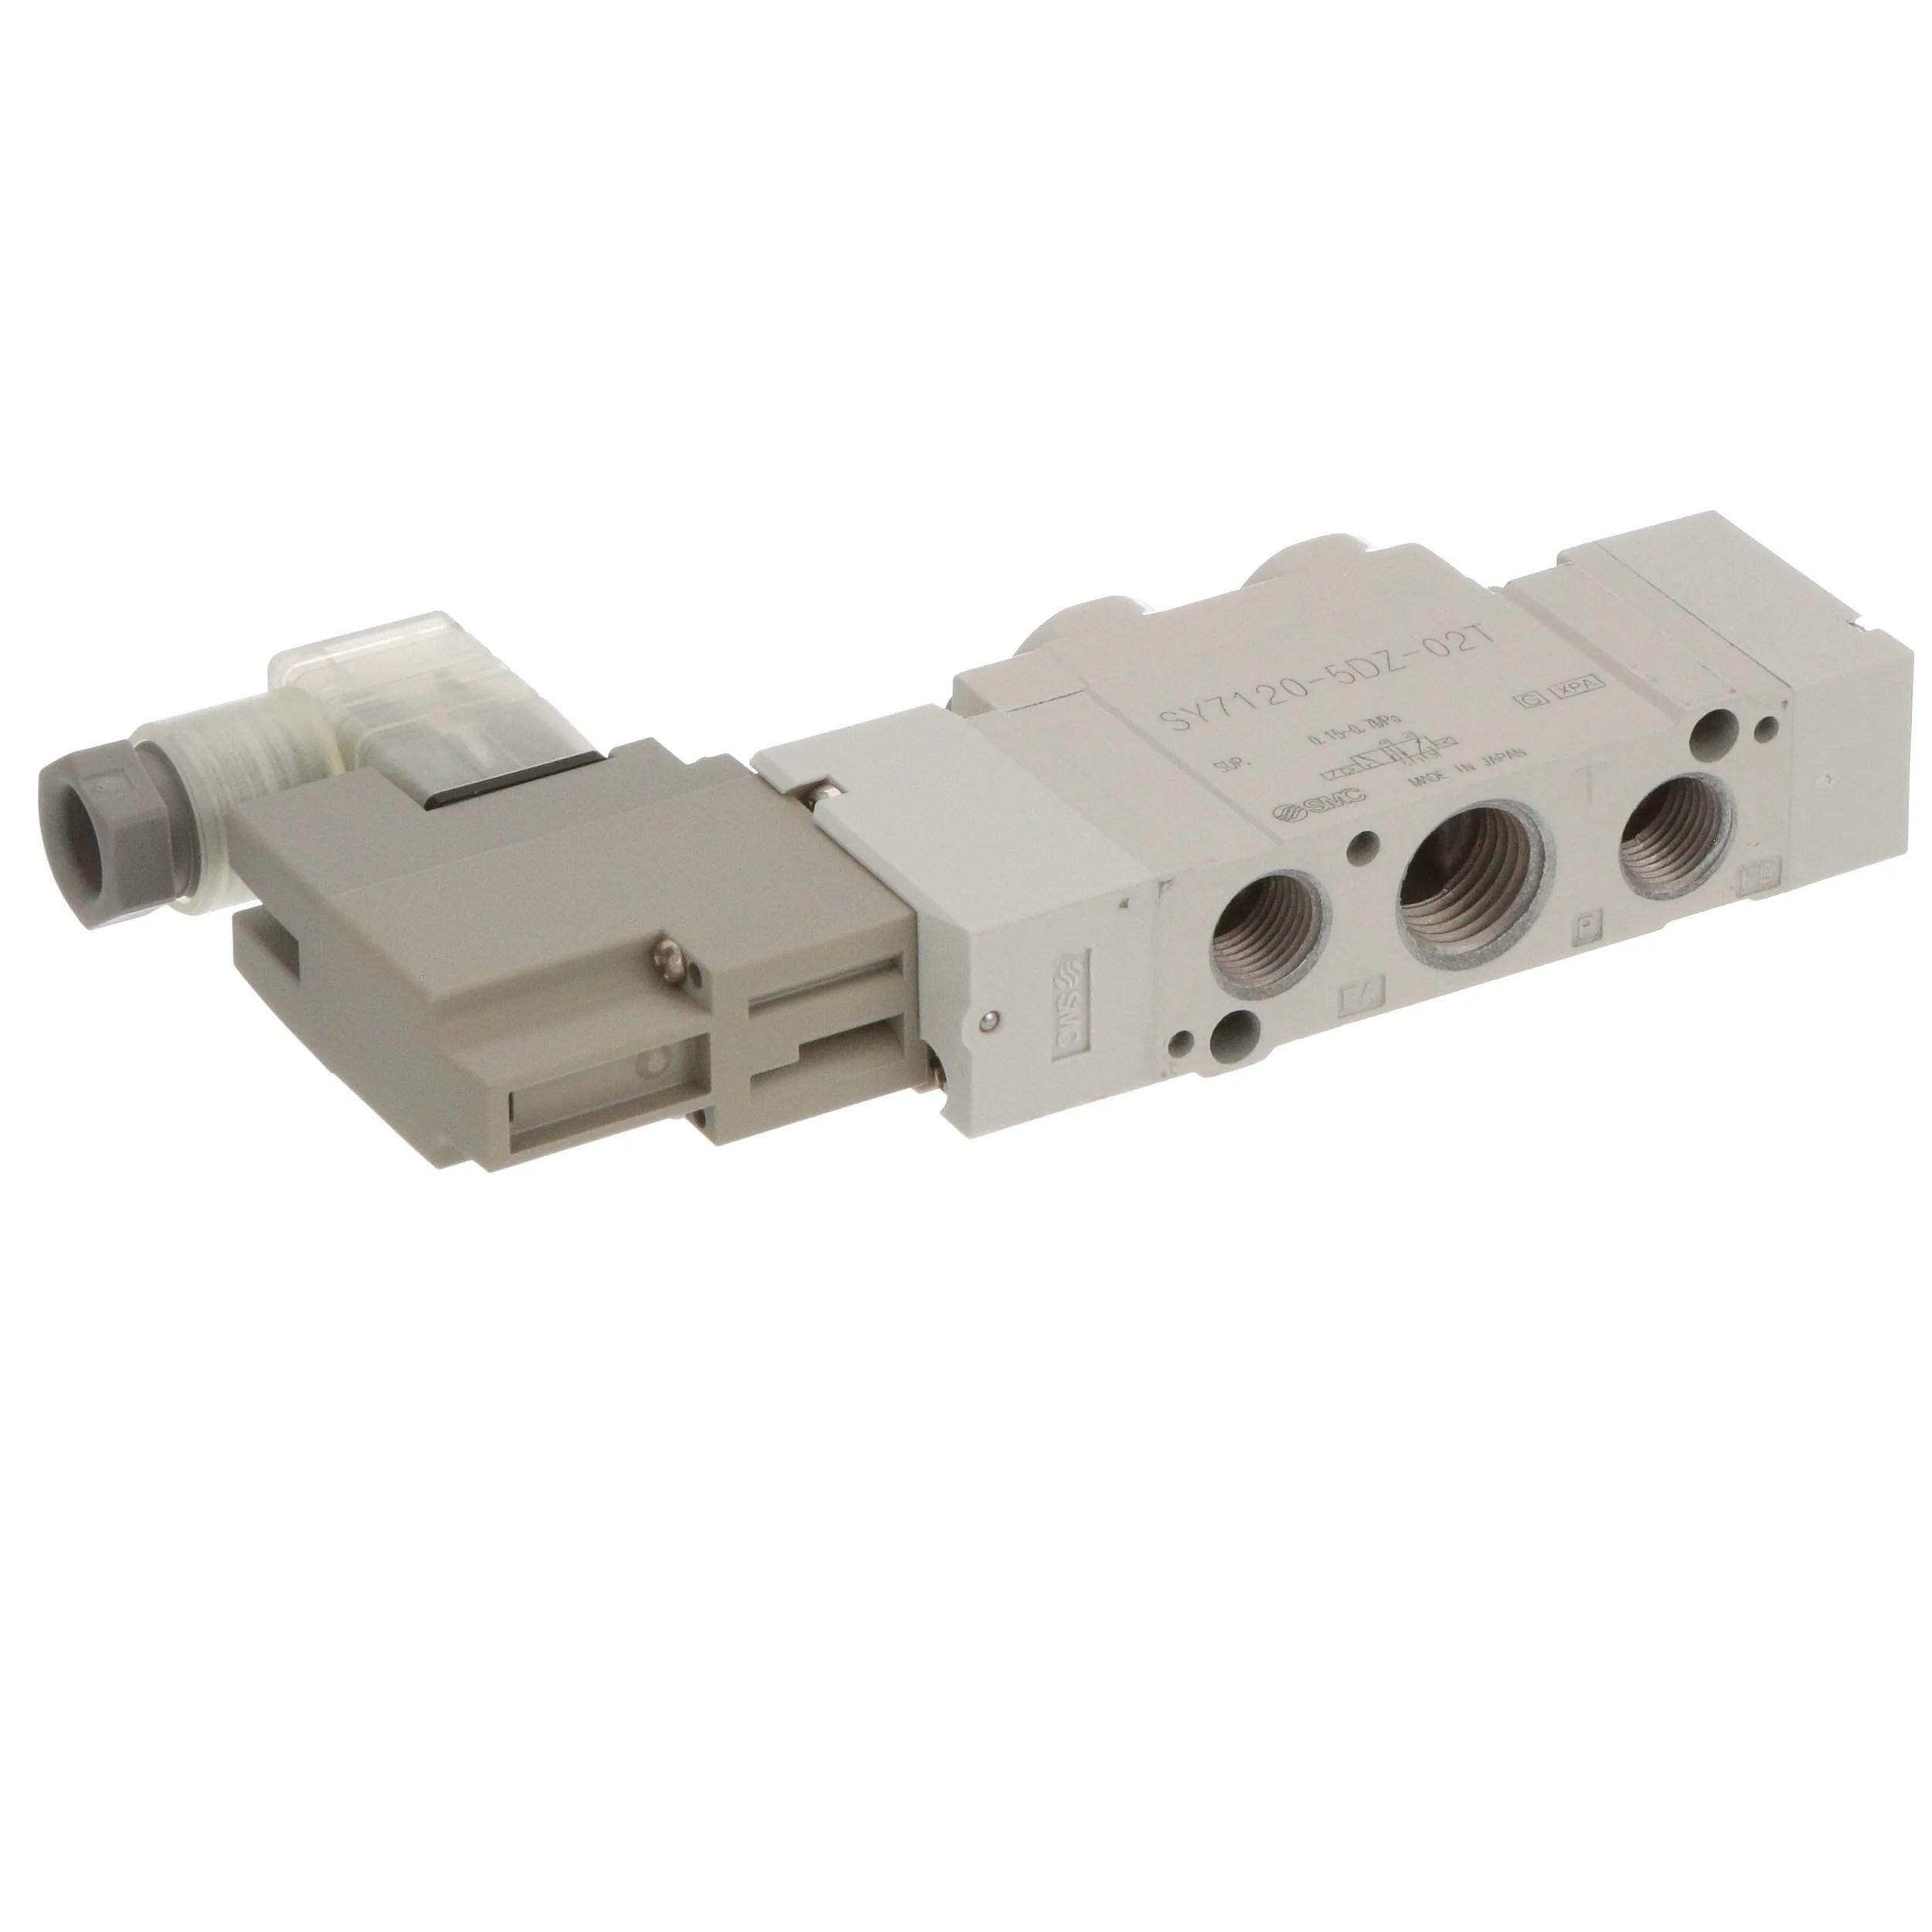 SMC Corporation - SY7120-5DZ-02T - Solenoid Valve; 5 port; 2